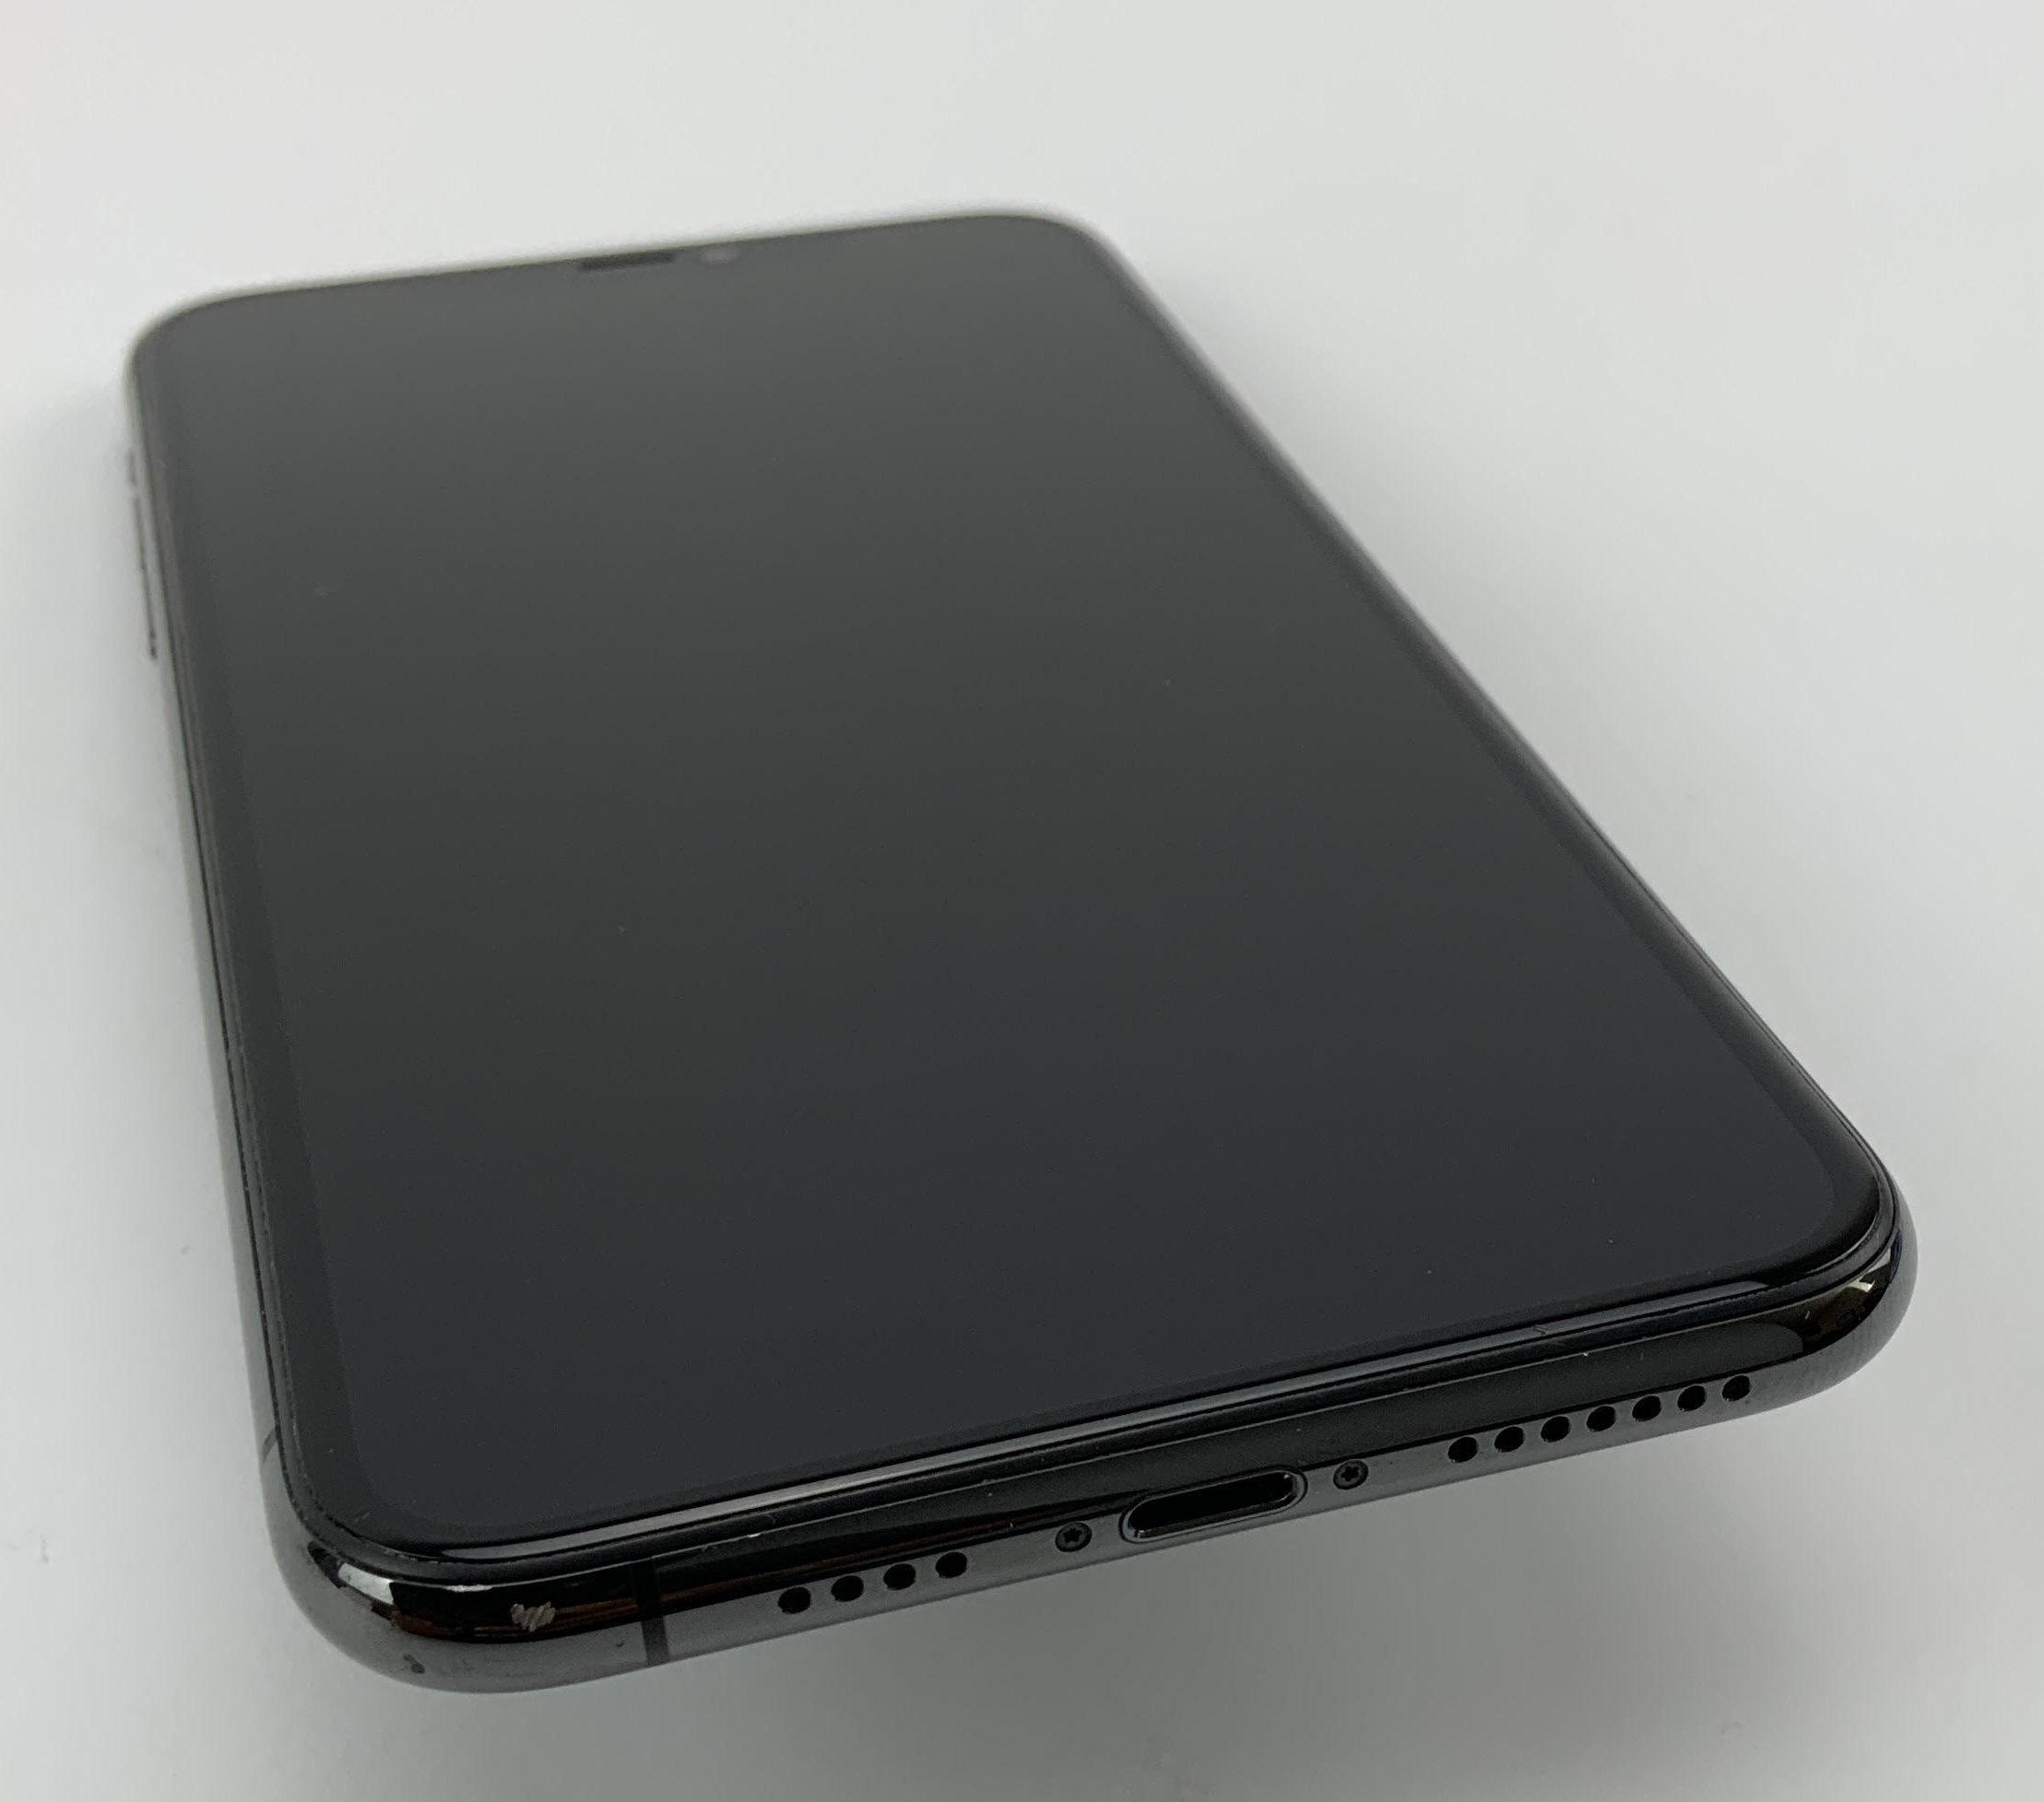 iPhone 11 Pro Max 64GB, 64GB, Space Gray, Bild 3